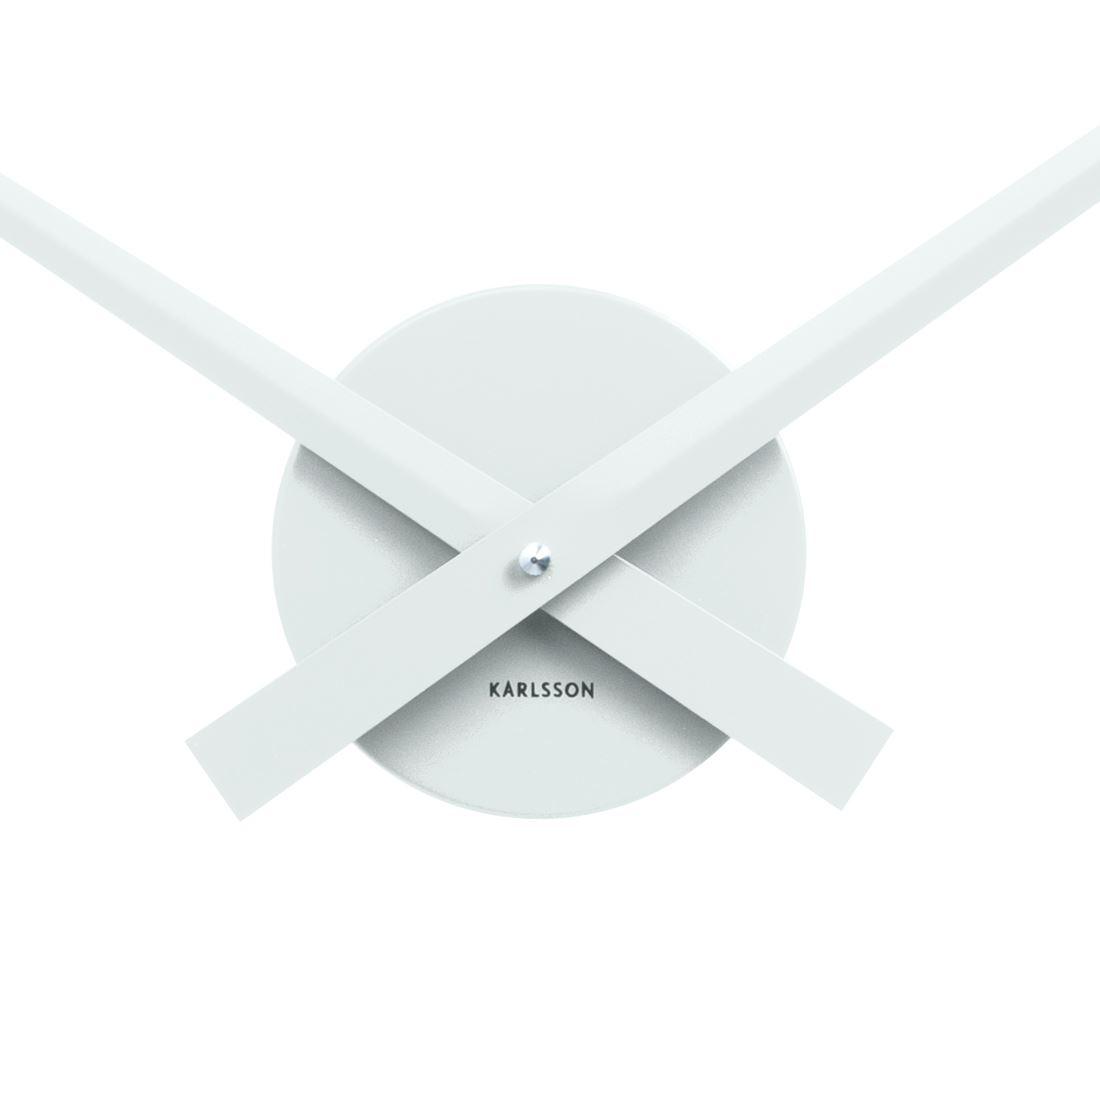 Karlsson Little Big Time Clock Aluminum Wall Clock Gold